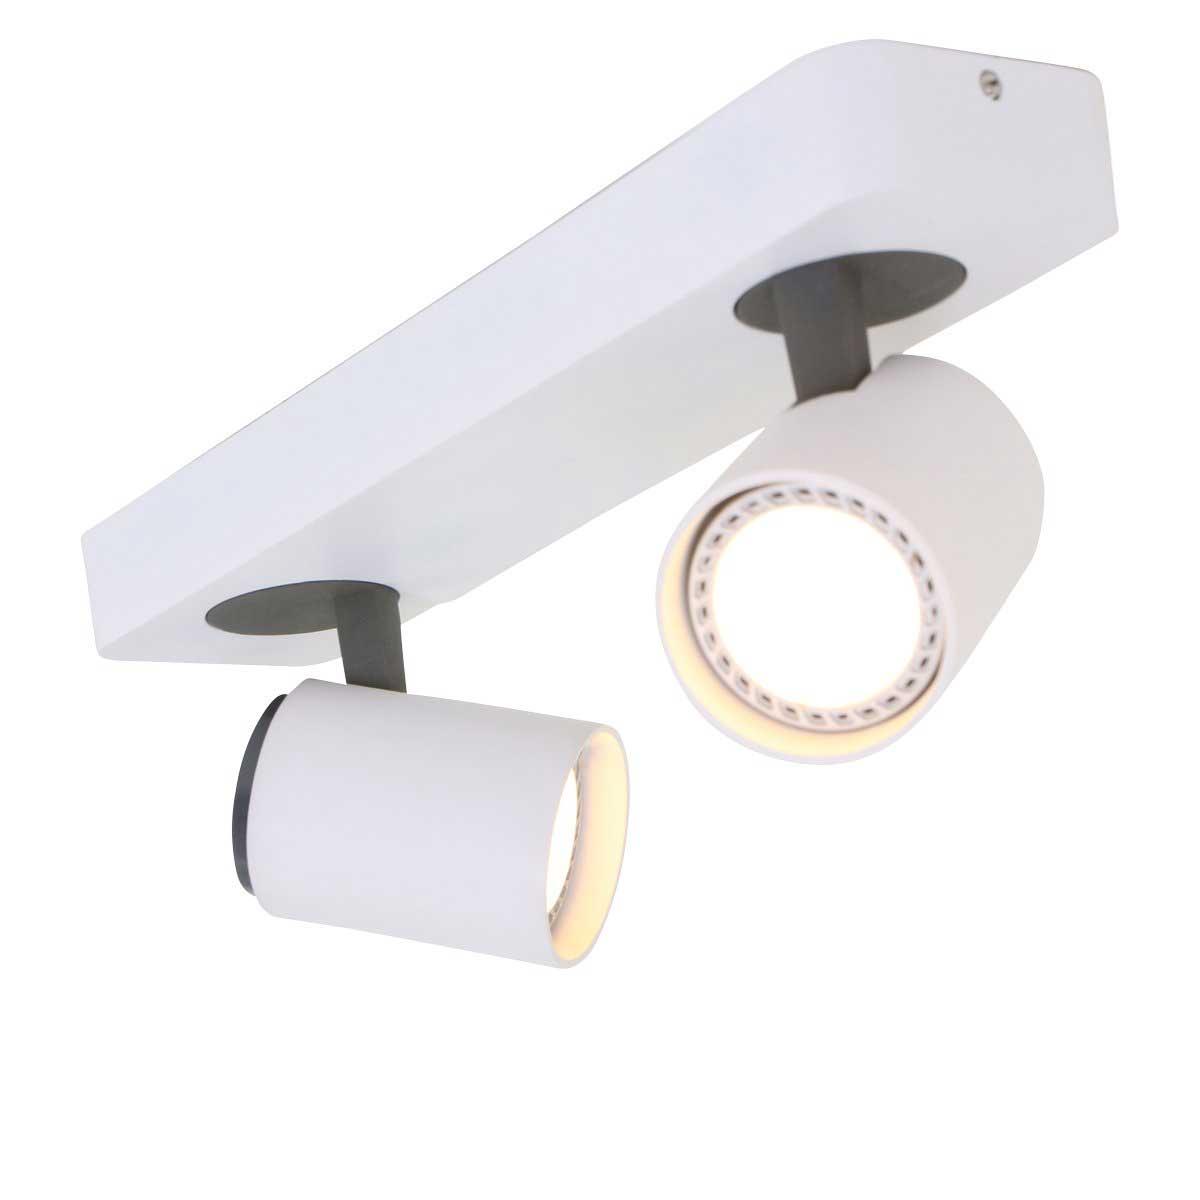 Spot 2-lichts gu10 MEXLITE - 1360W - Plafondlamp- Spots- Mexlite- Mexlite- Modern - Design- Wit Zwart - Metaal